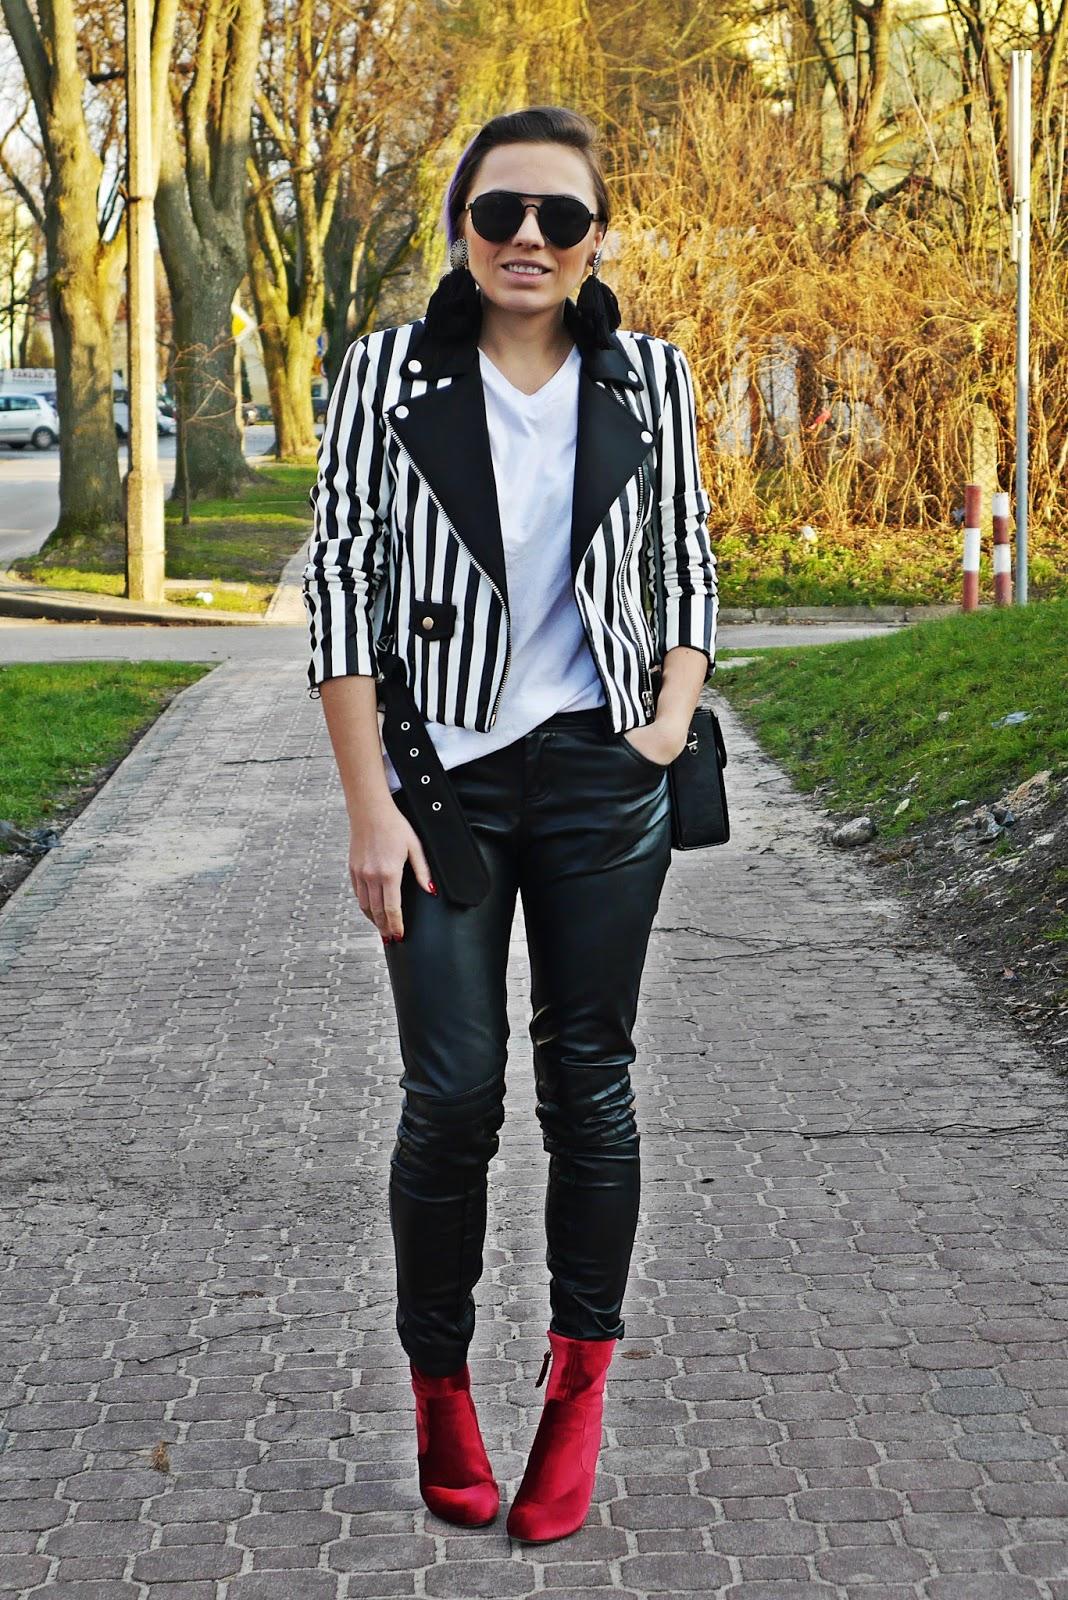 9_pulawy_blog_modowy_blogerka_modowa_karyn_111217